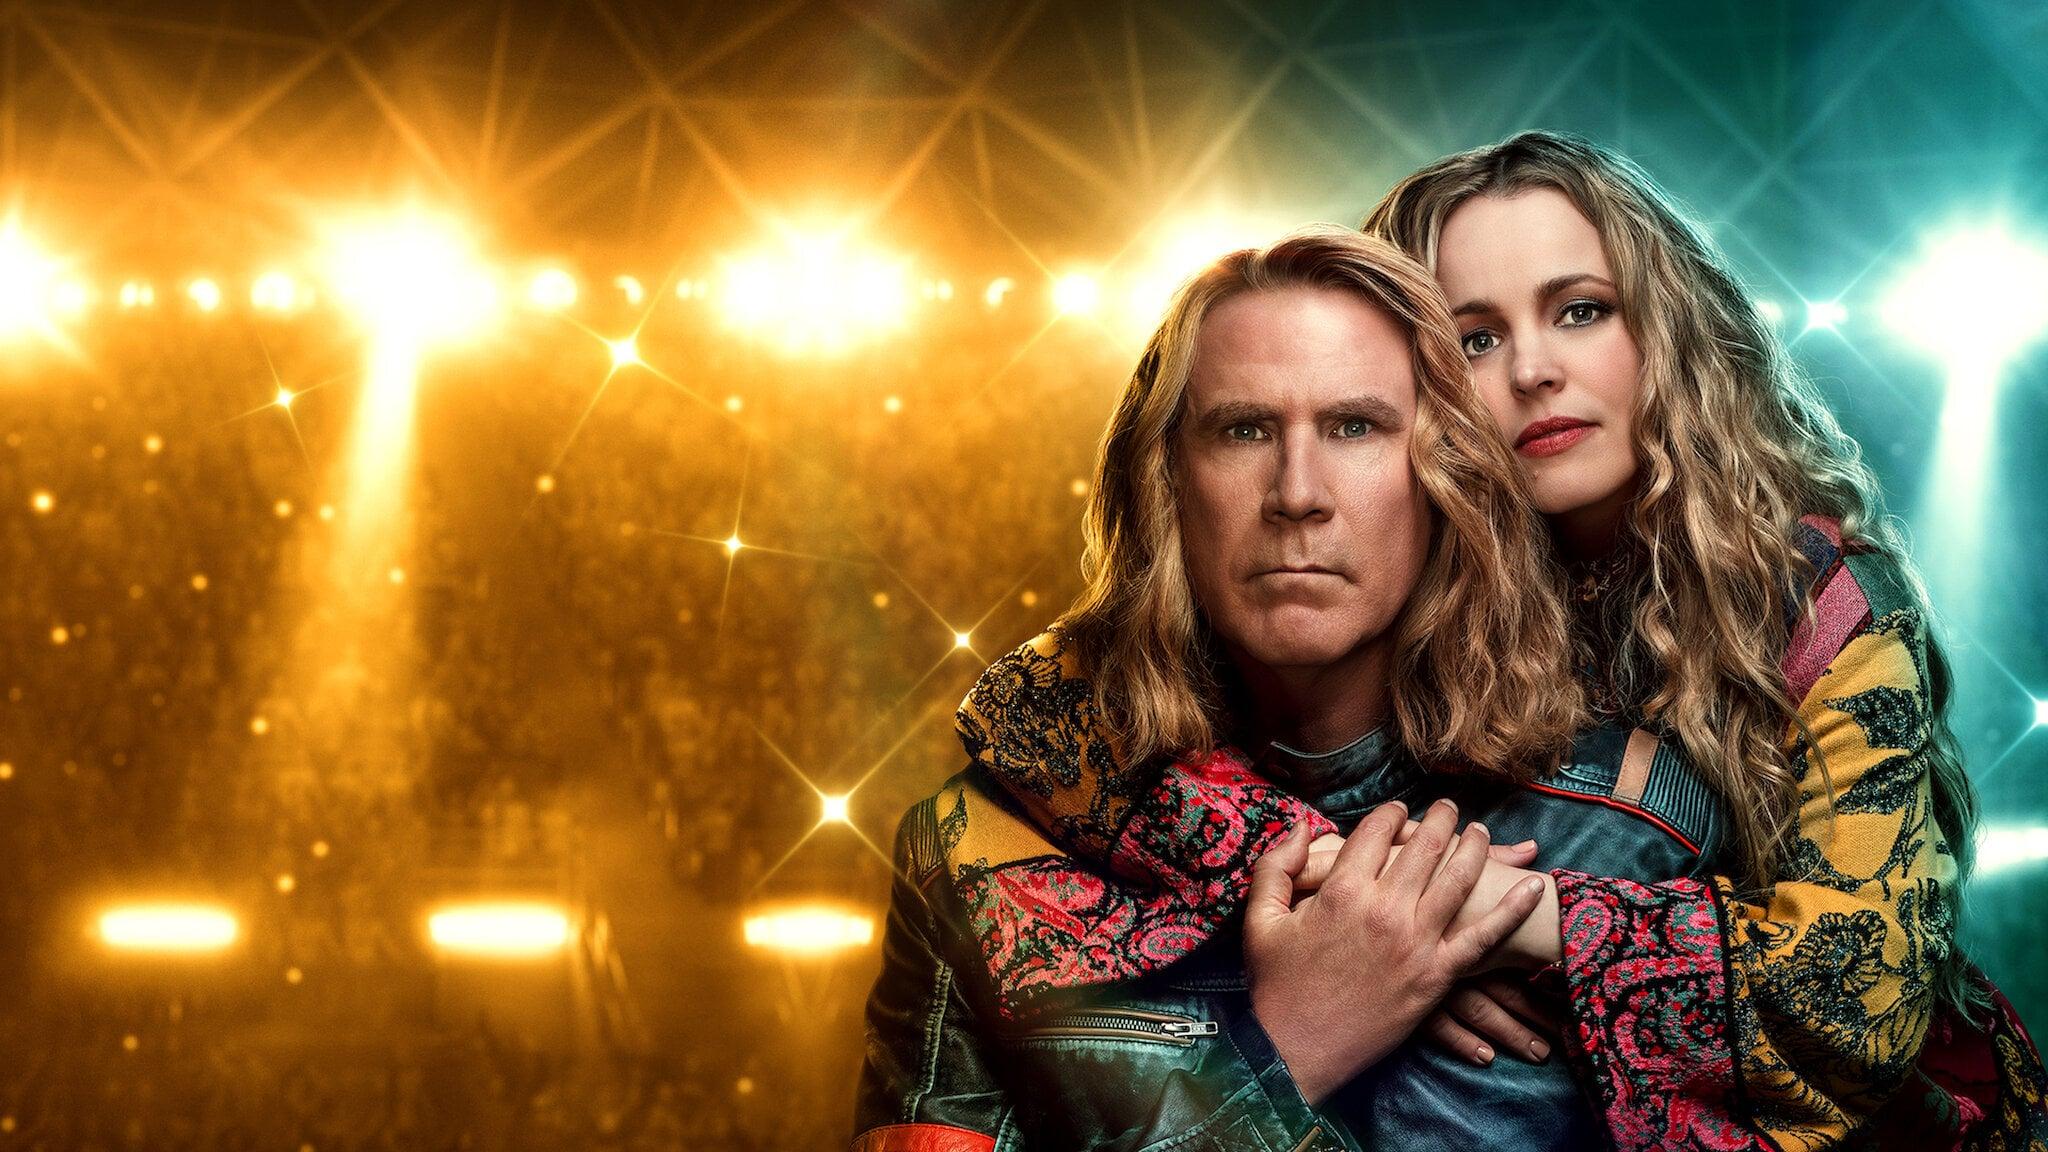 Regarder Eurovision Song Contest: The Story of Fire Saga en streaming gratuit